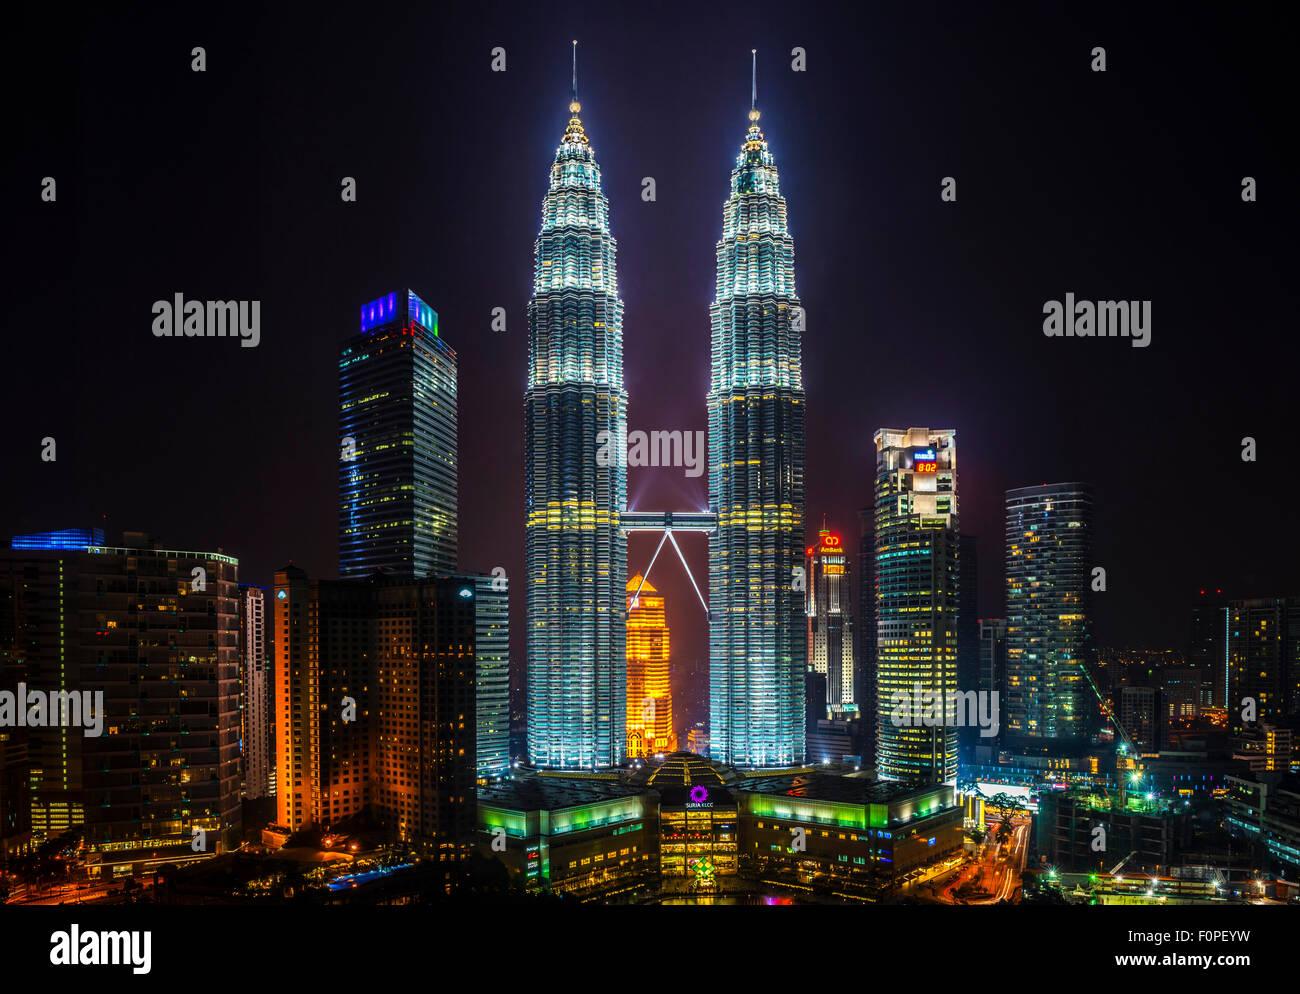 Petronas Towers, Kuala Lumpur, Malaysia at night - Stock Image